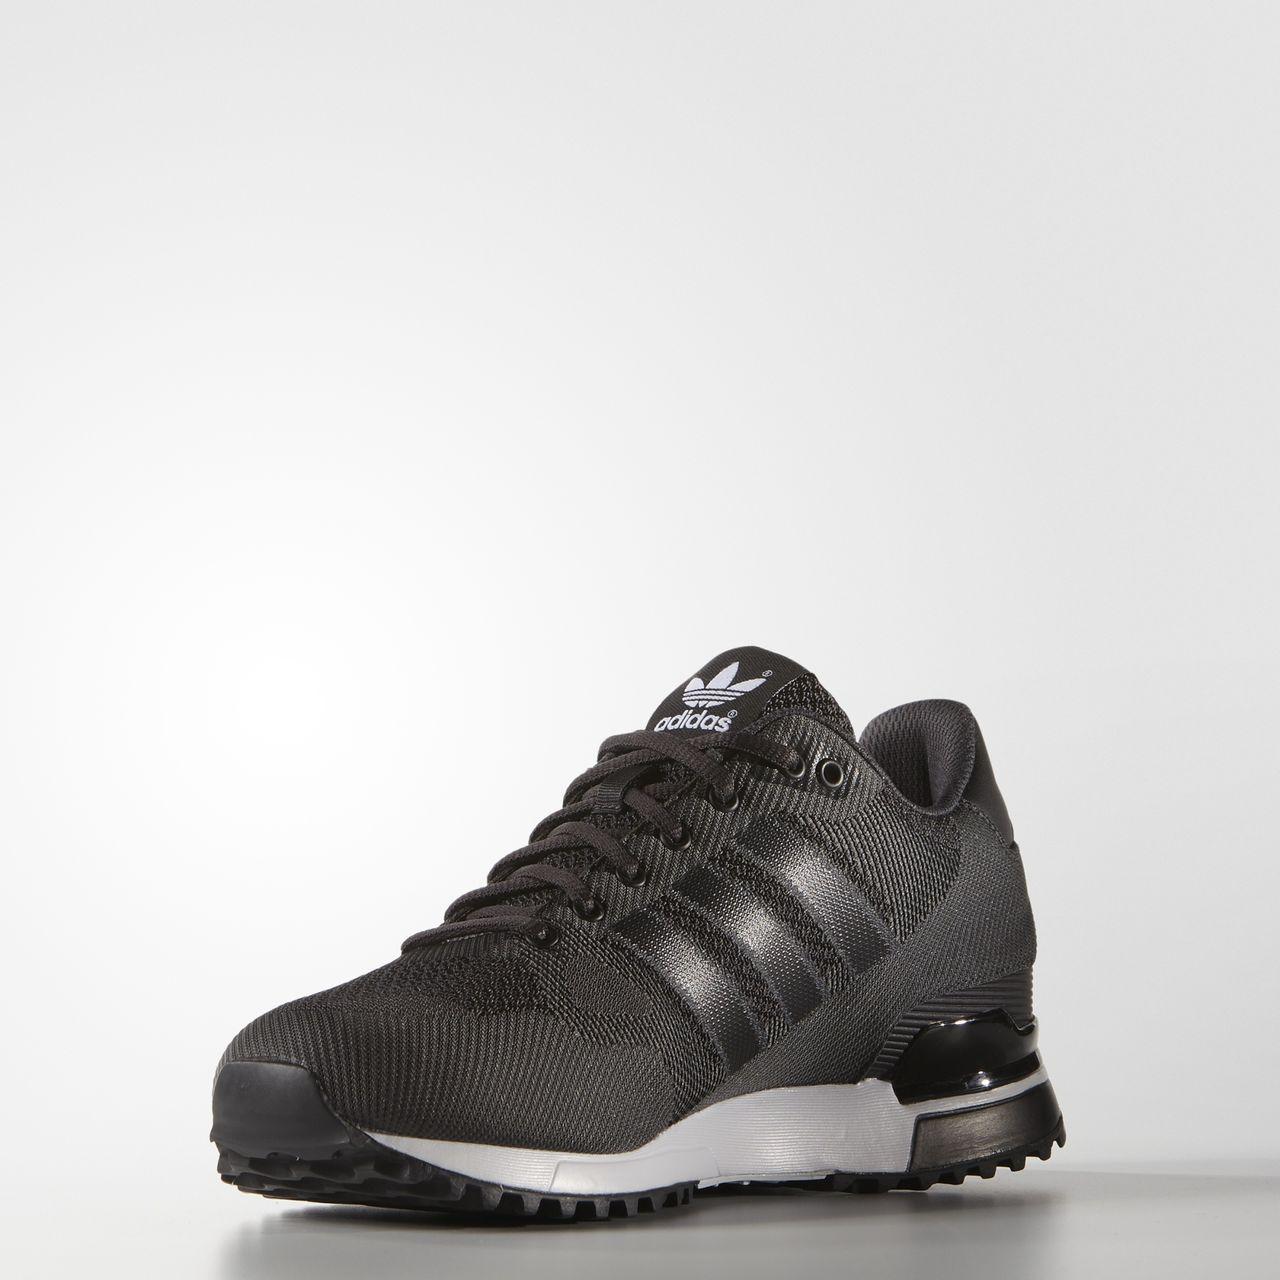 on sale 98af9 f7e8b ... cheapest adidas zx 750 shoes shadow black s16 st adidas sweden 0490d  3cc41